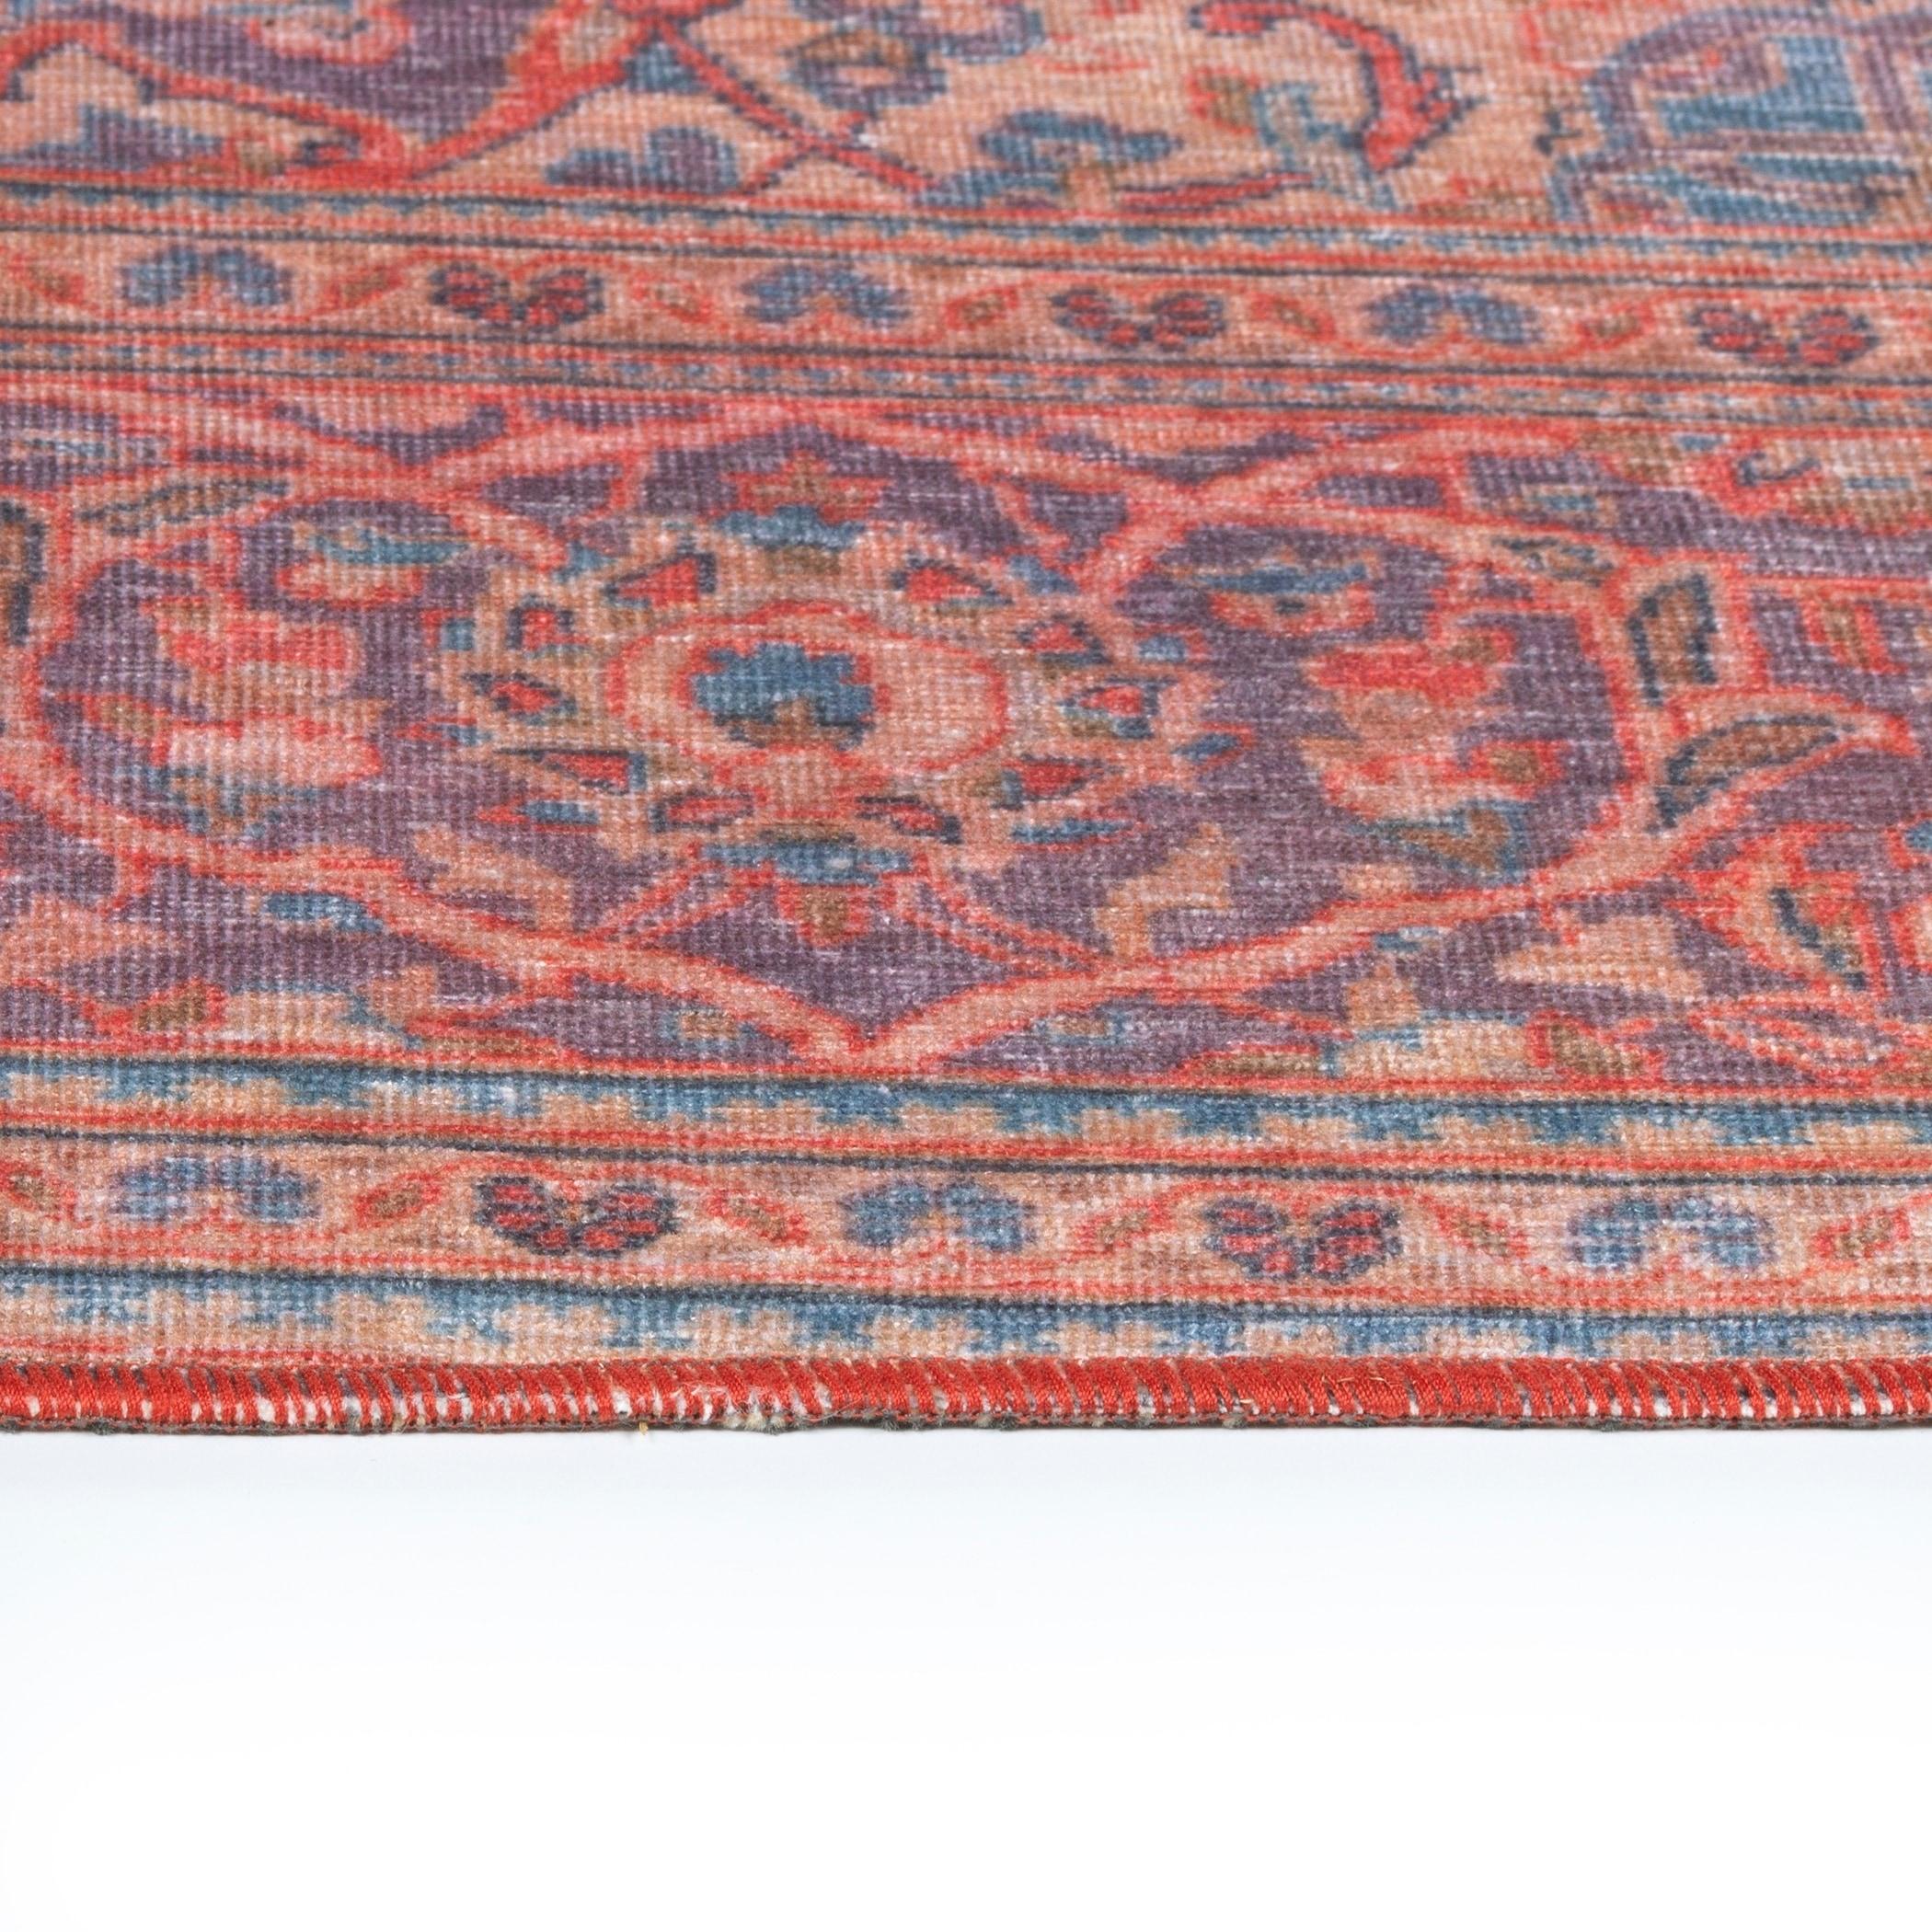 Ballard Indoor/Outdoor Vintage Printed Replica Rug